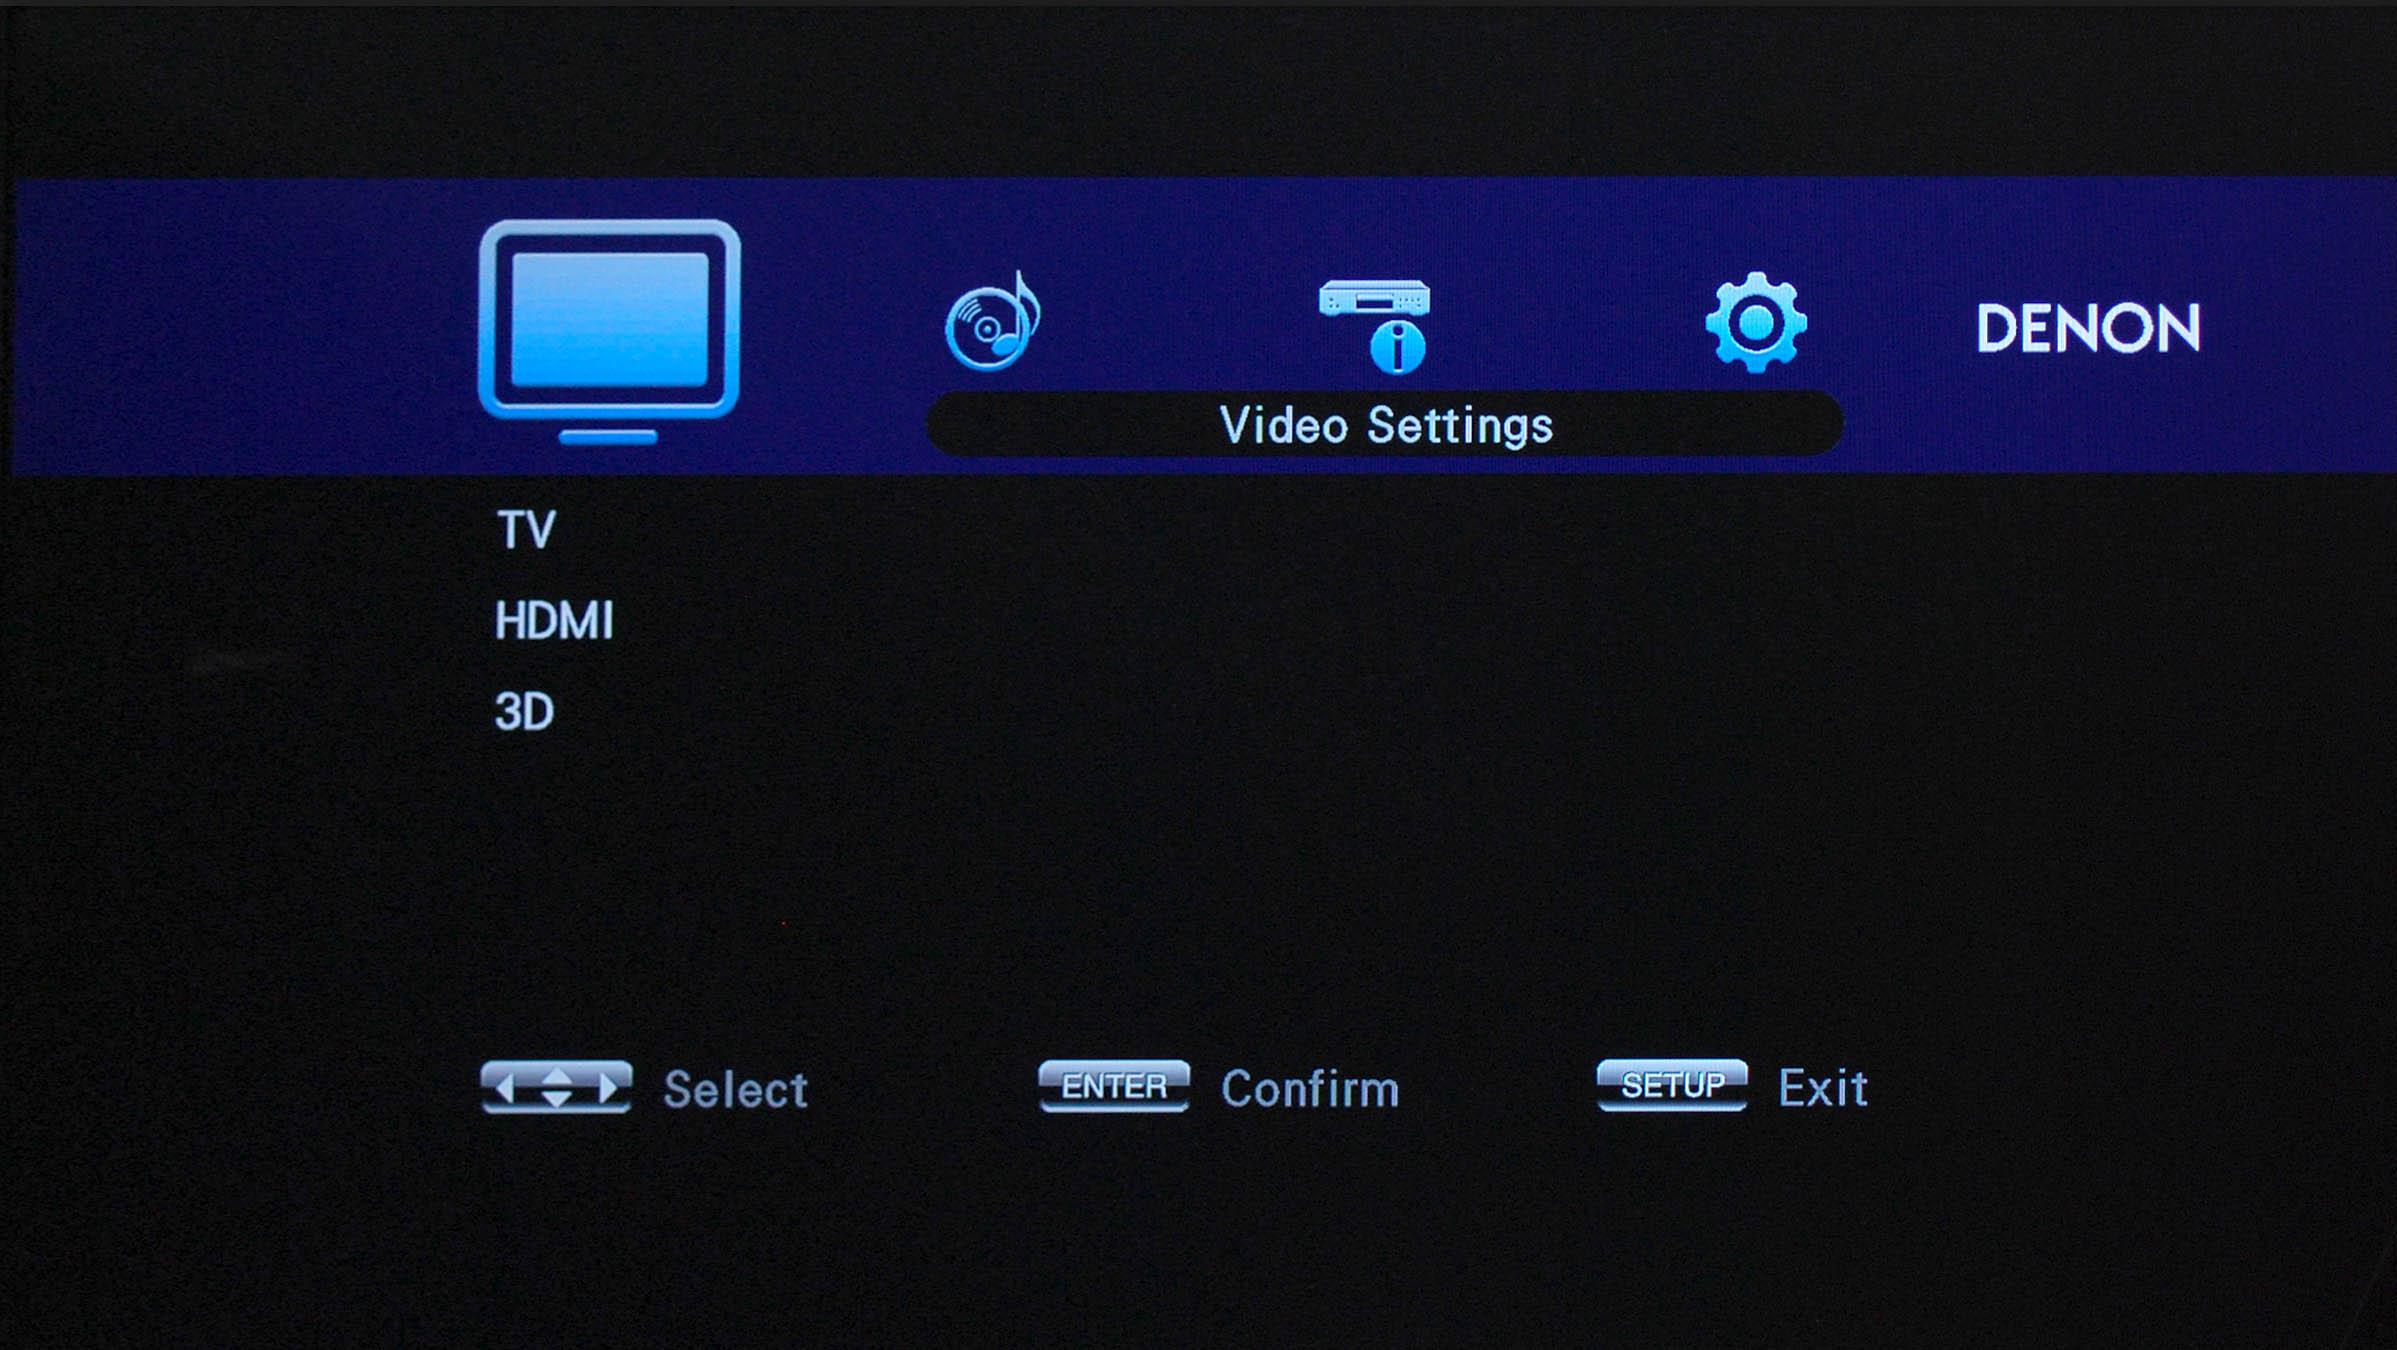 Denon DBT-1713UD GUI Screen 2